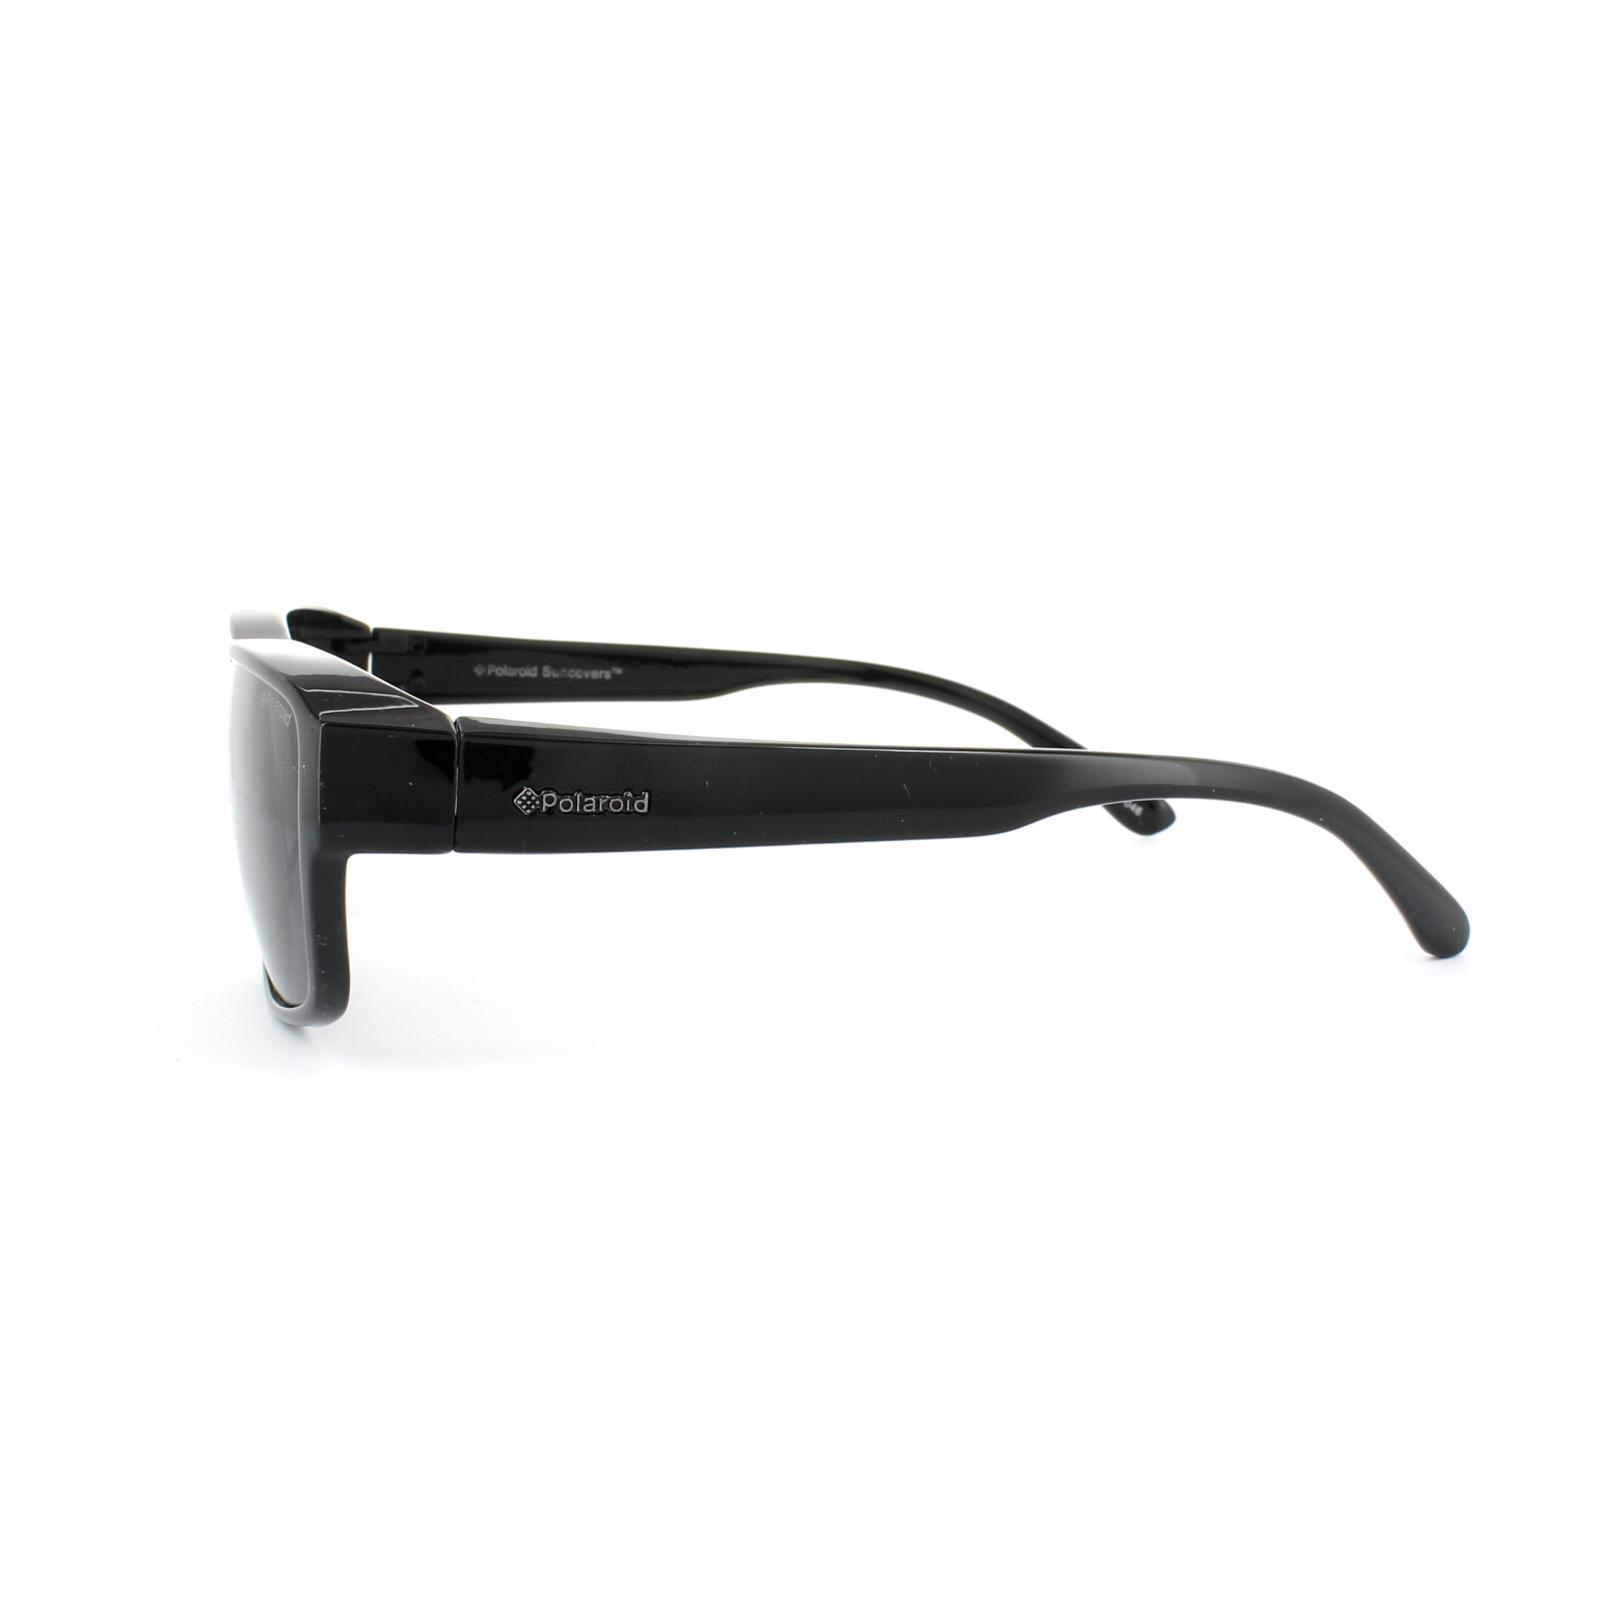 8886d9ebe76 Sentinel Polaroid Suncovers Fitover Sunglasses P8406 KIH Y2 Black Grey  Polarized